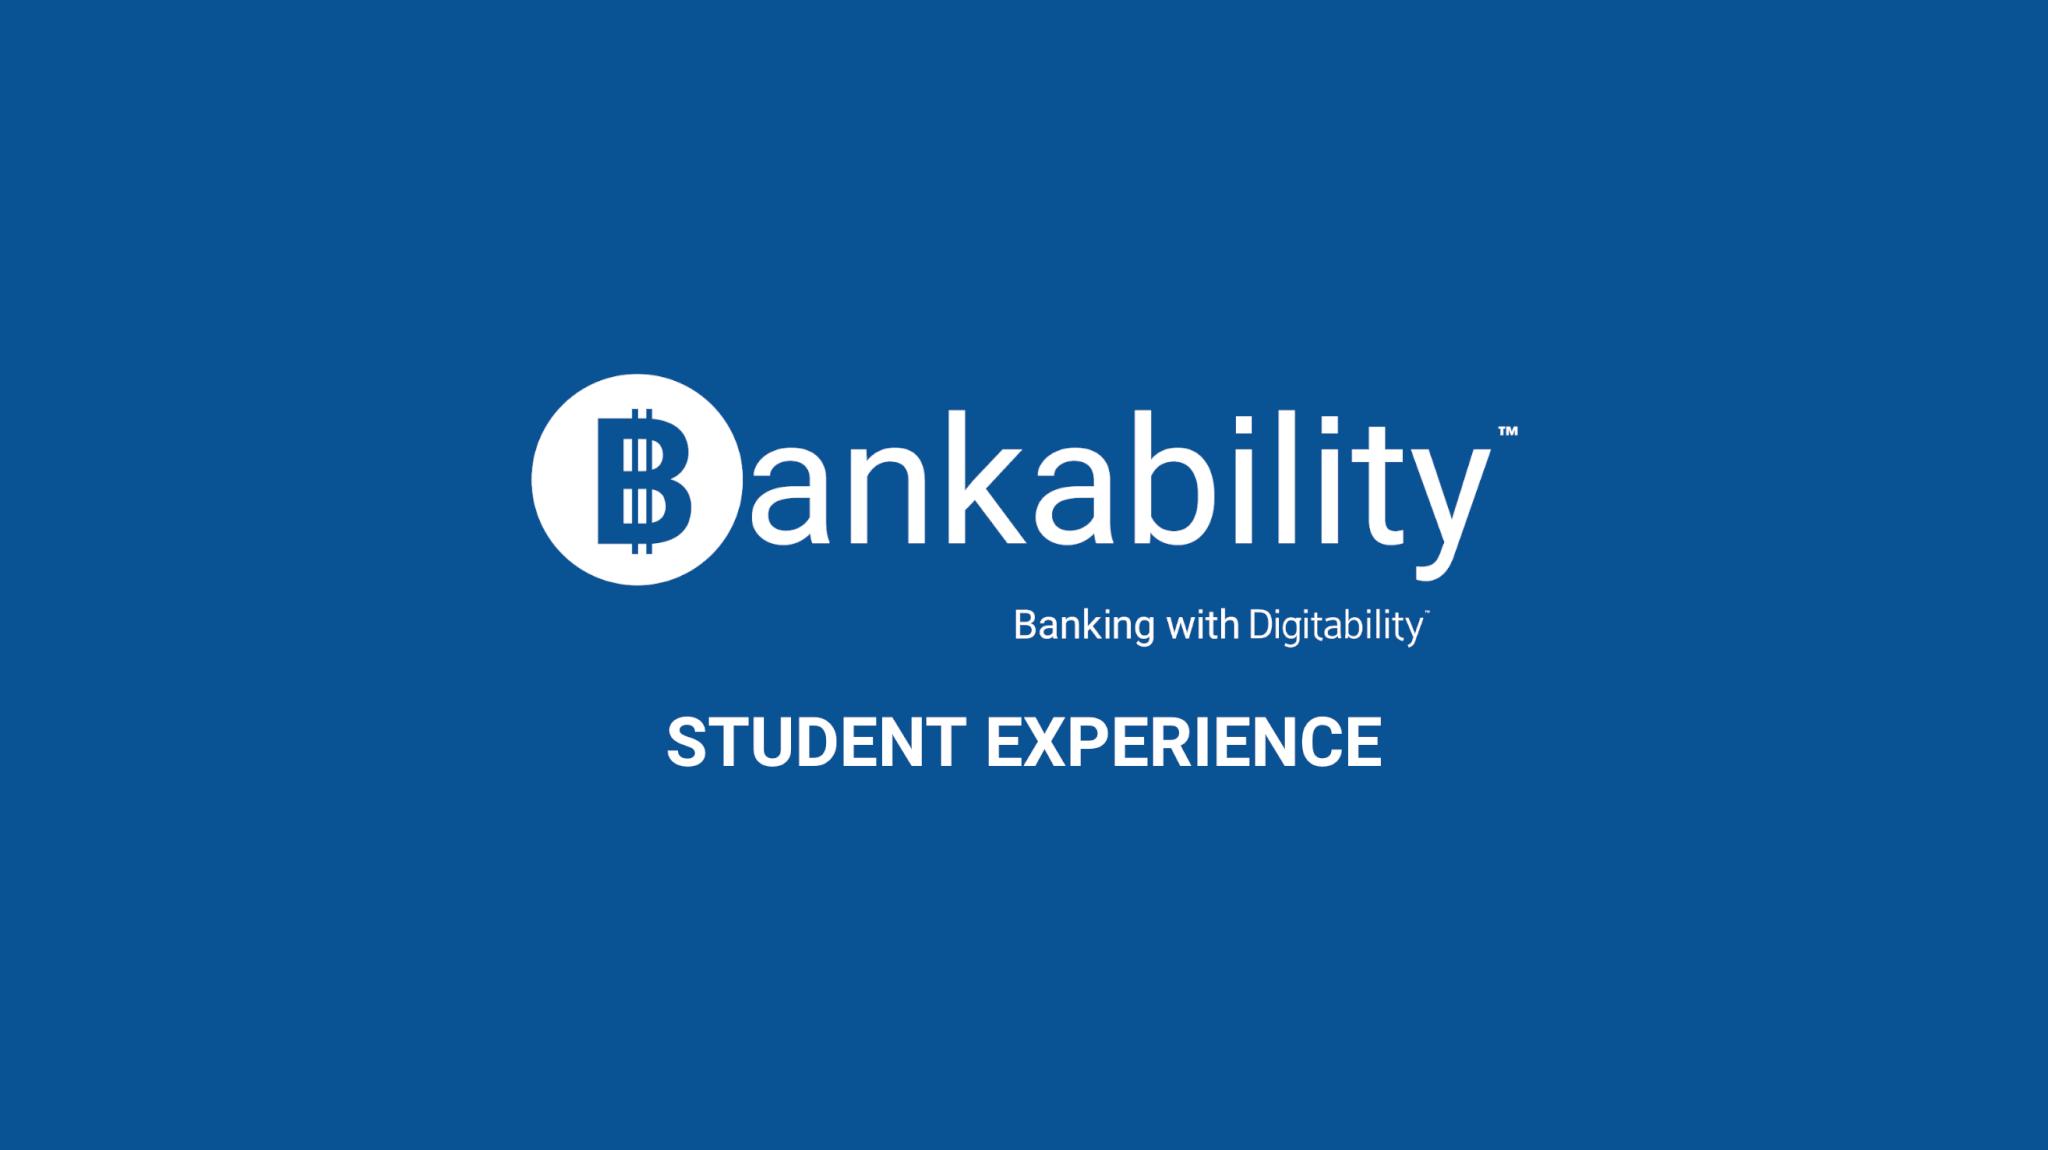 0 Bankability